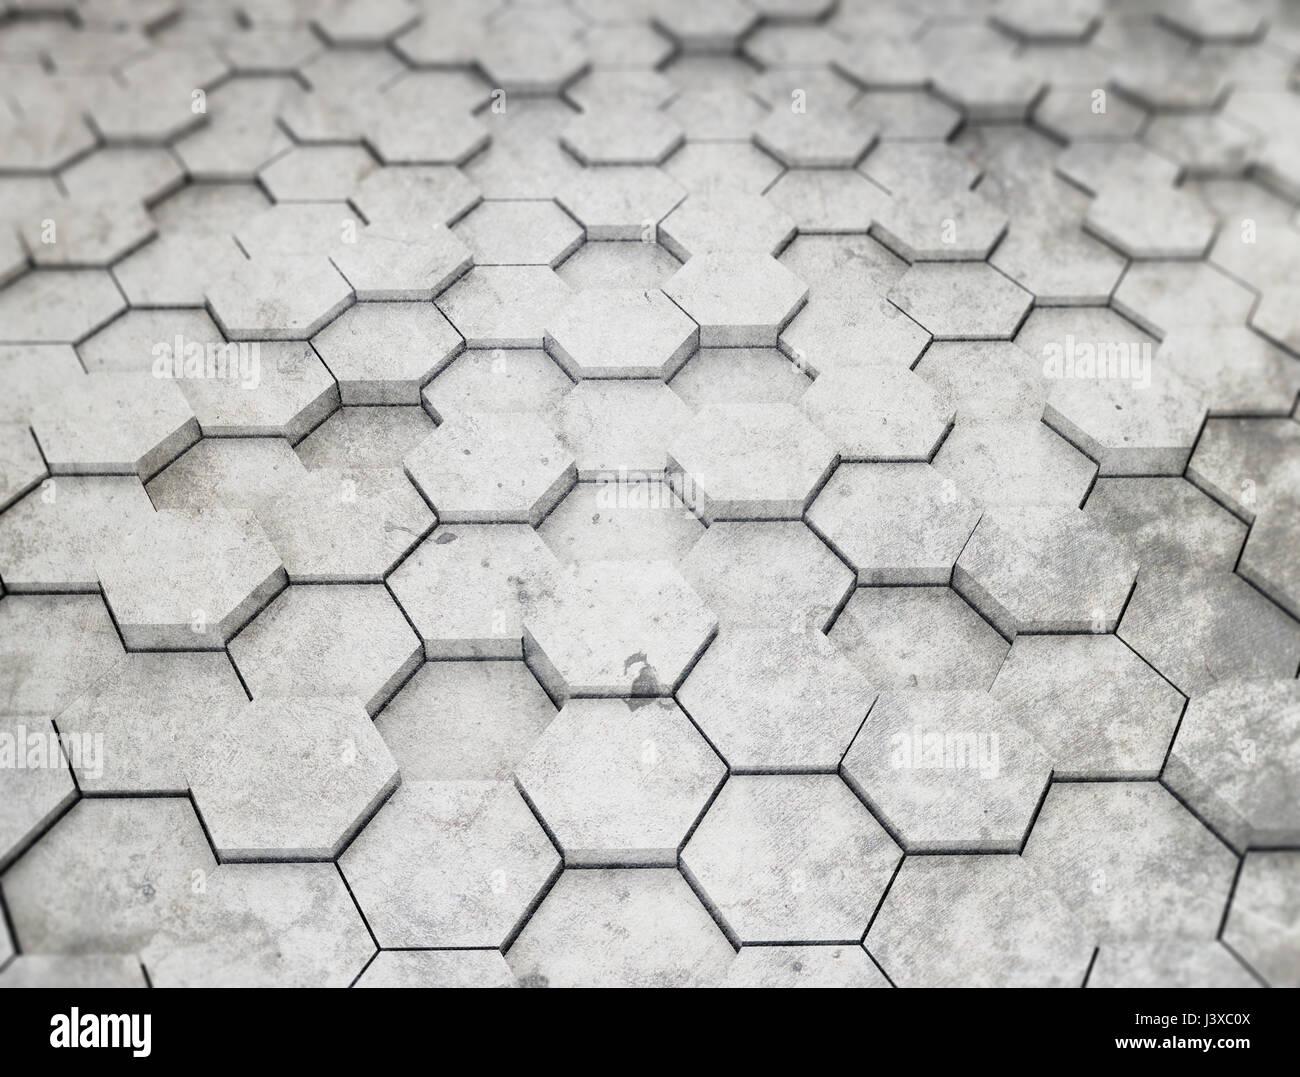 Hexagon pattern 3d background - Stock Image